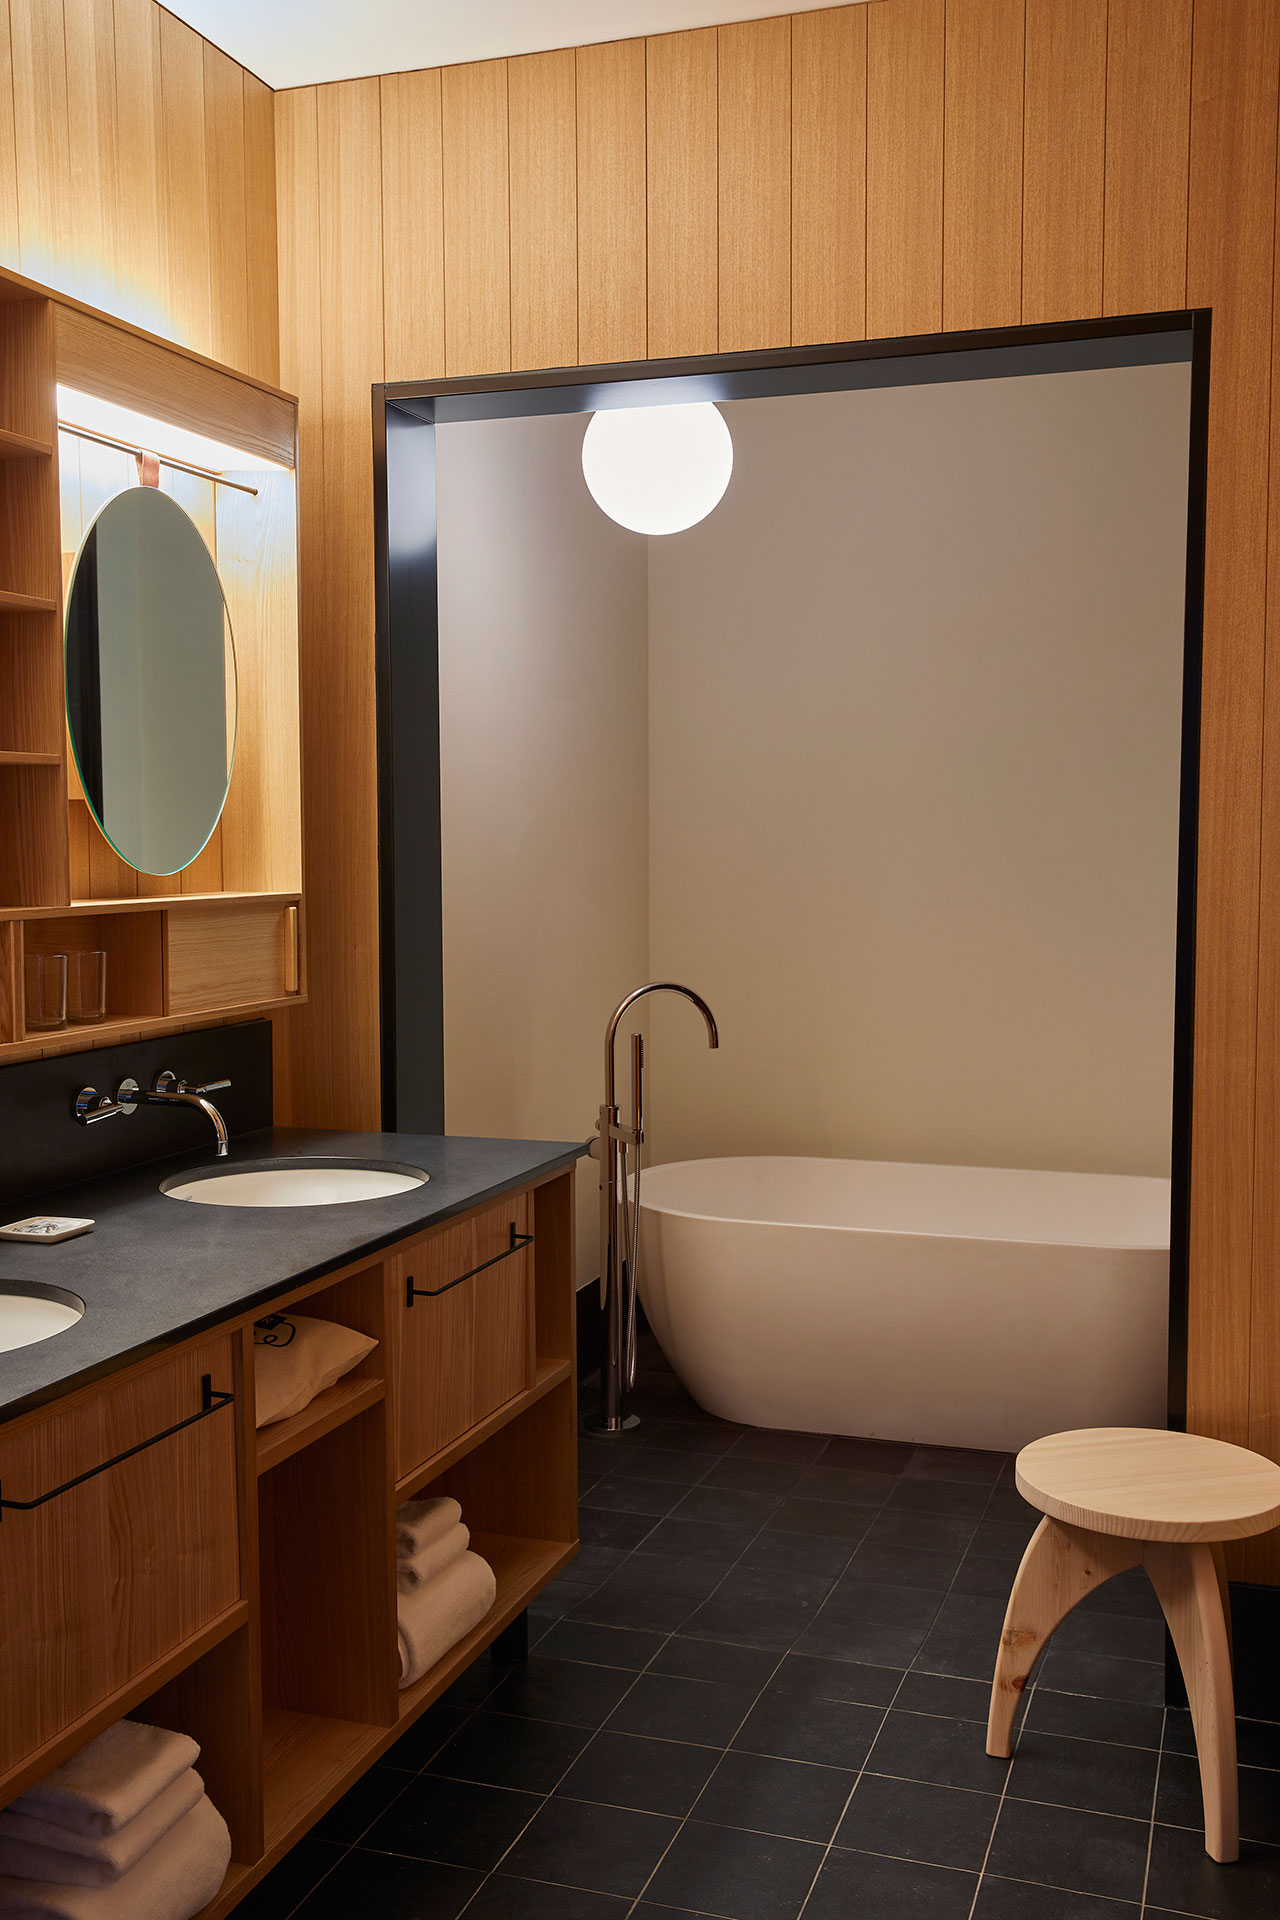 Ace Hotel Kyoto. Suite bathroom. Photo by Yoshihiro Makino.